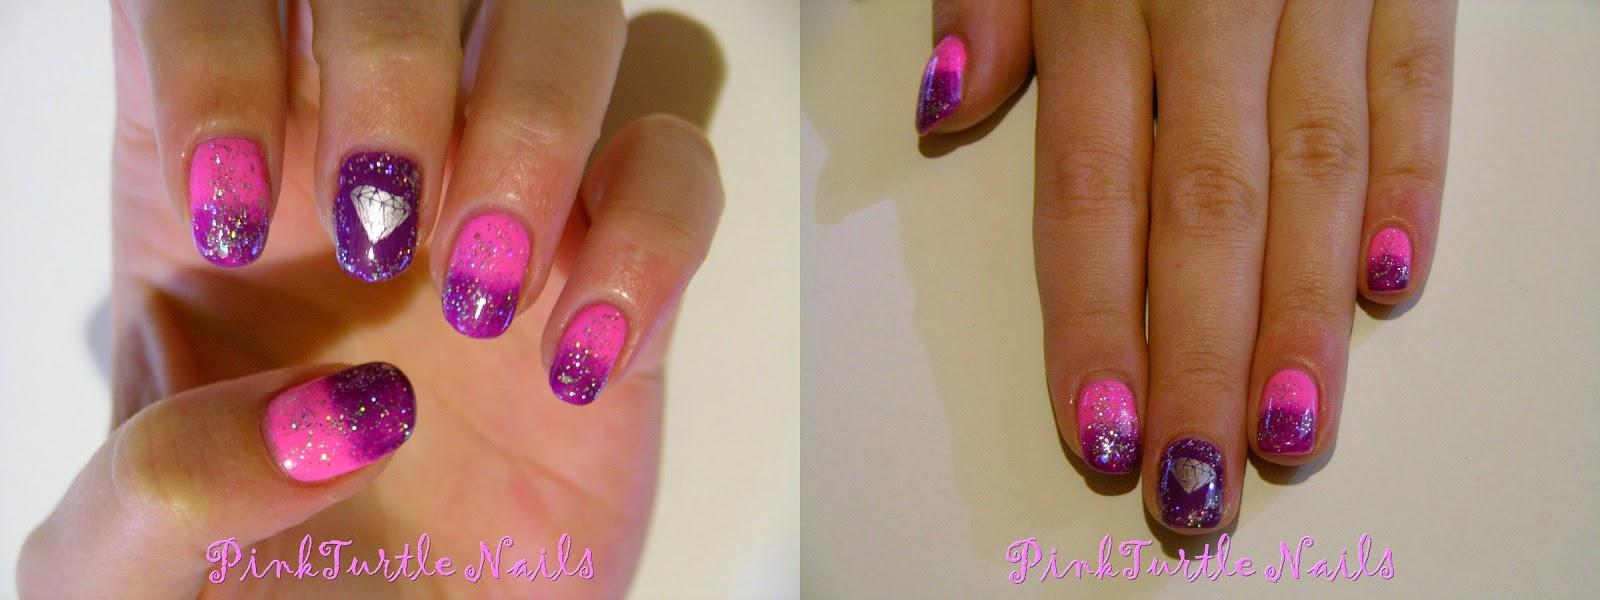 http://pinkturtlenails.blogspot.com.es/2015/03/reto-31-dias-cancion.html